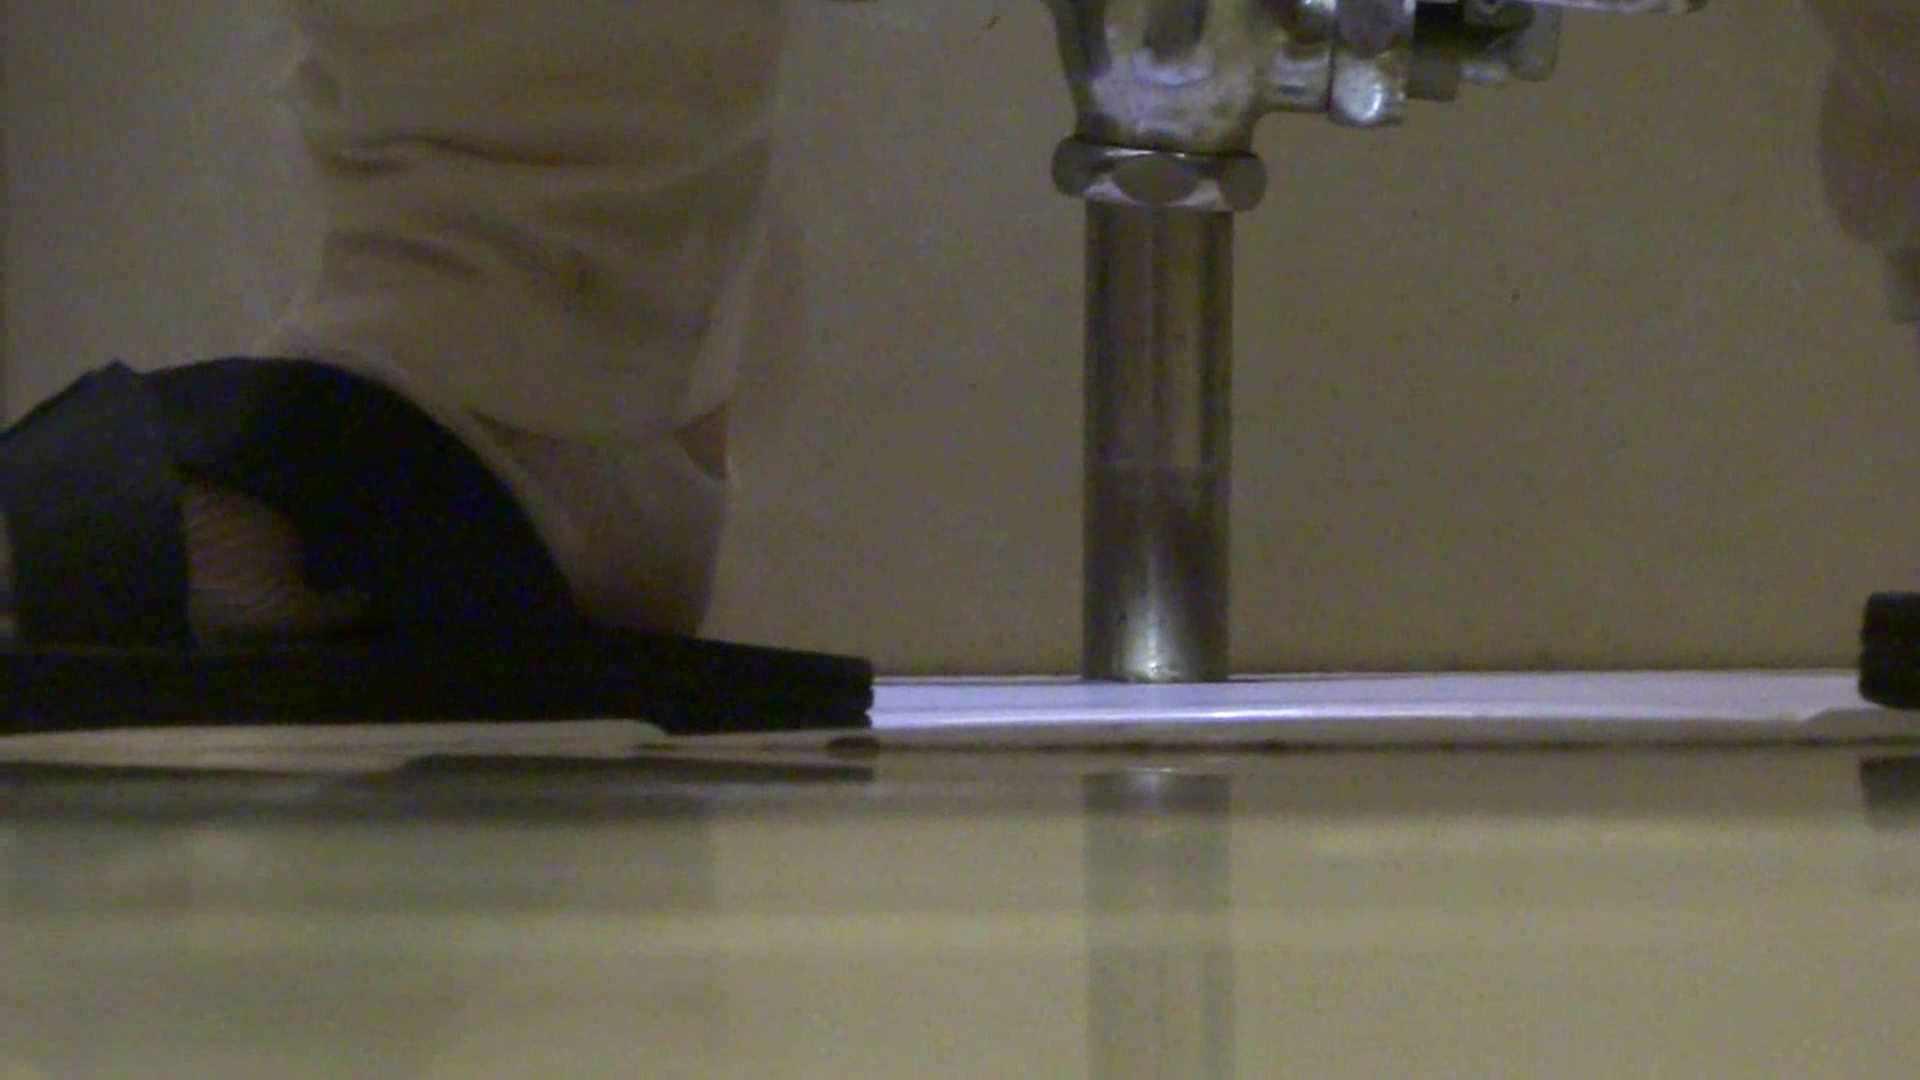 隣国化粧室下から御免!! No.15 洗面所 | 美女H映像  103画像 46